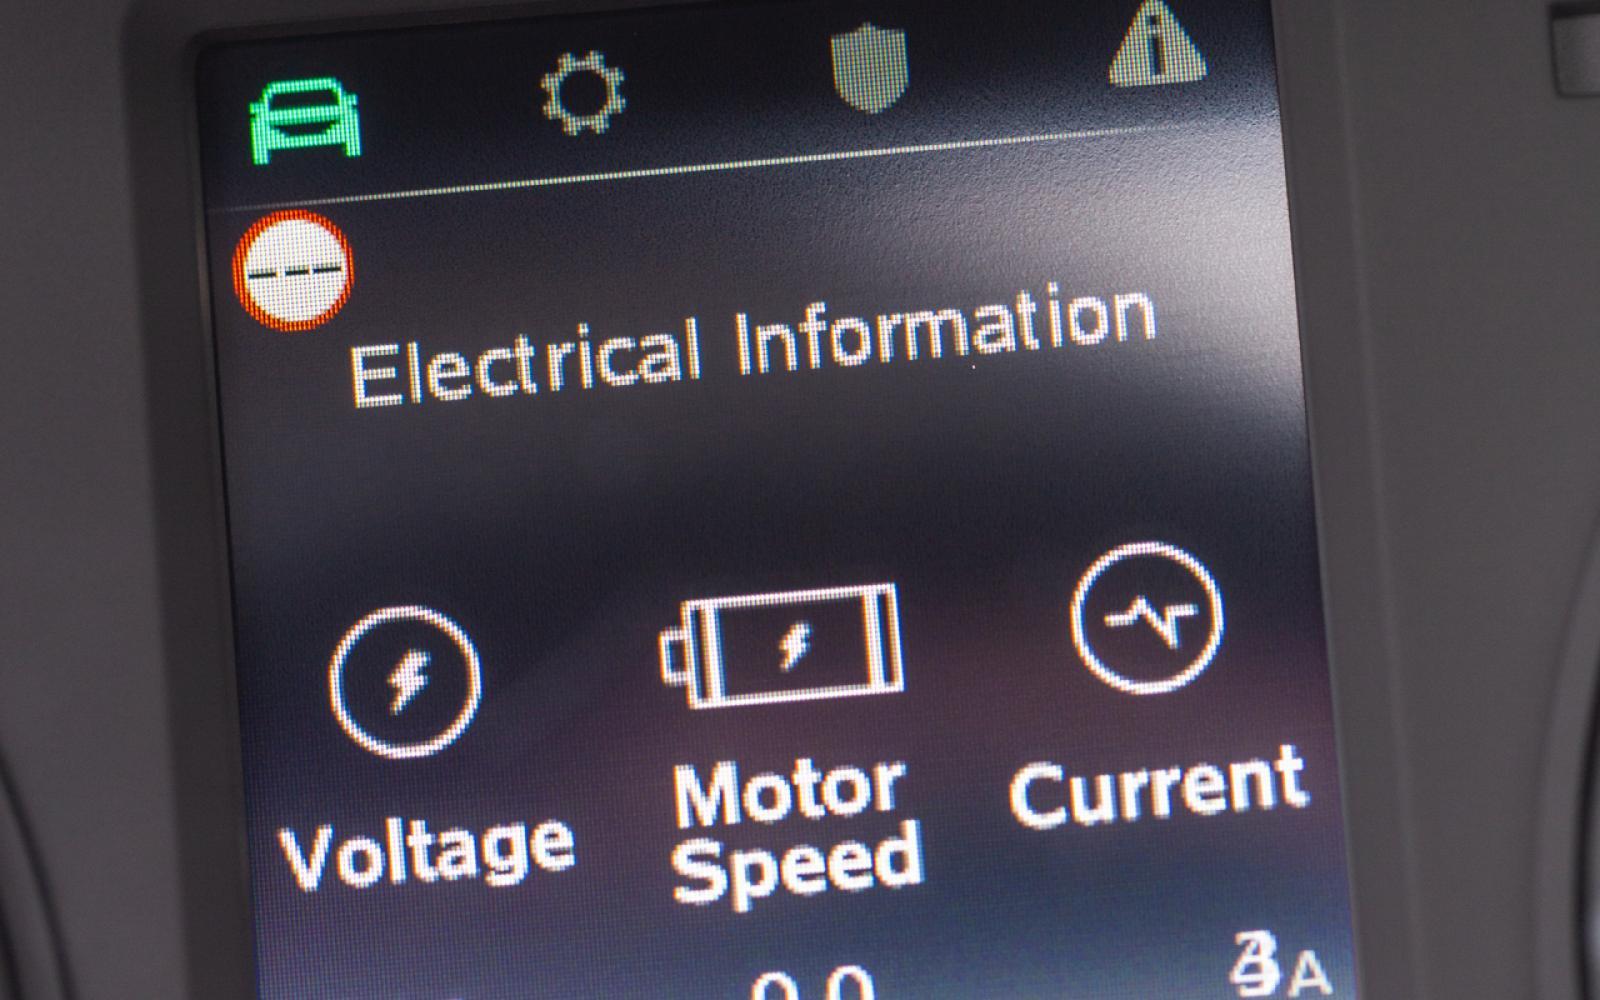 MG ZS EV is elektrisch en eigenaardig